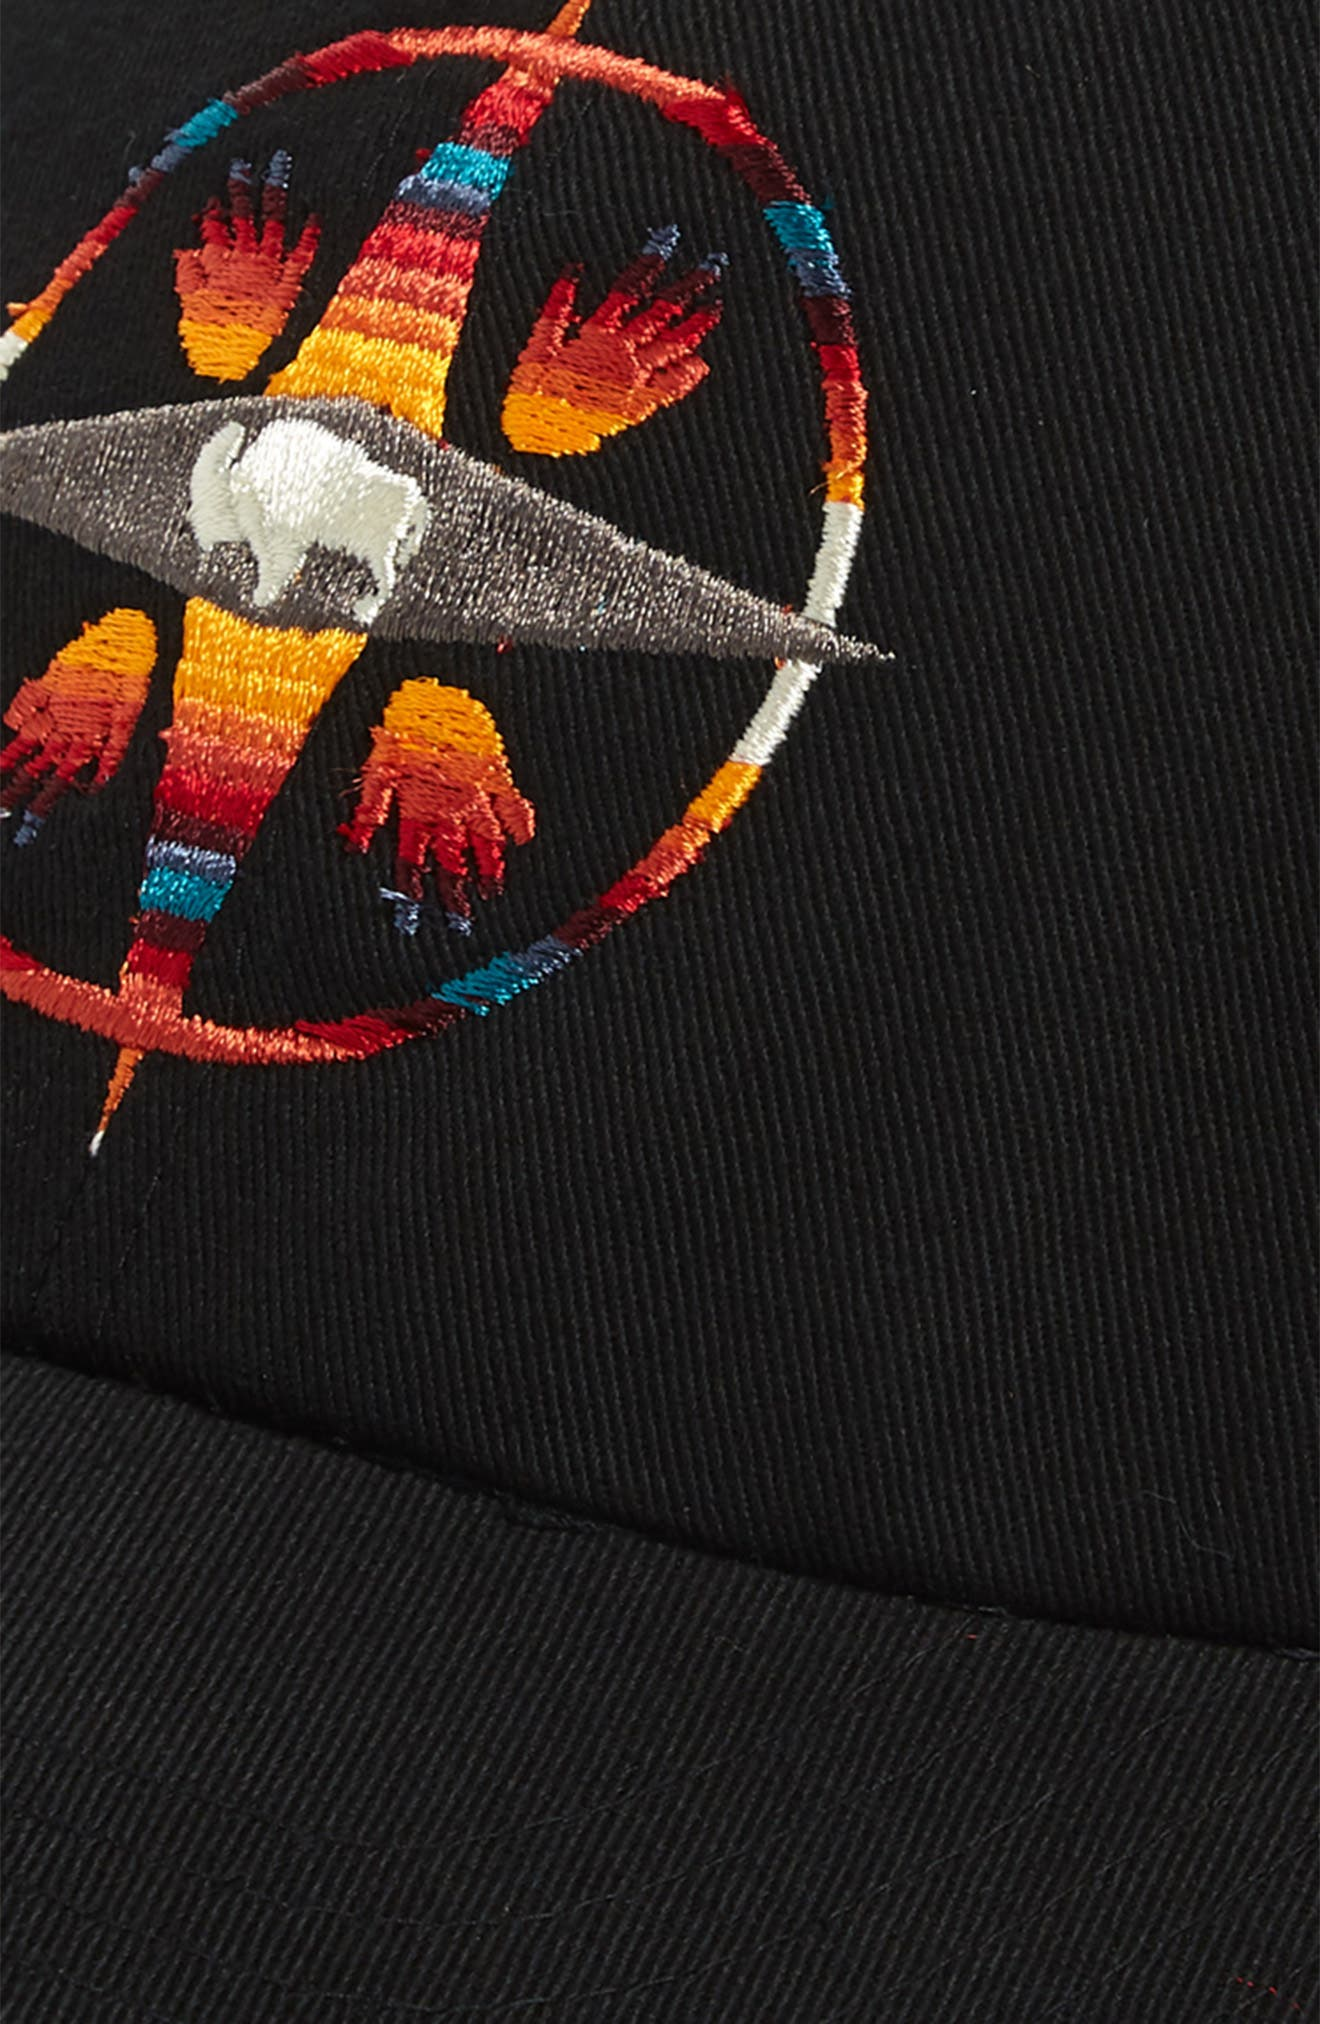 Big Medicine Embroidered Cap,                             Alternate thumbnail 3, color,                             BLACK